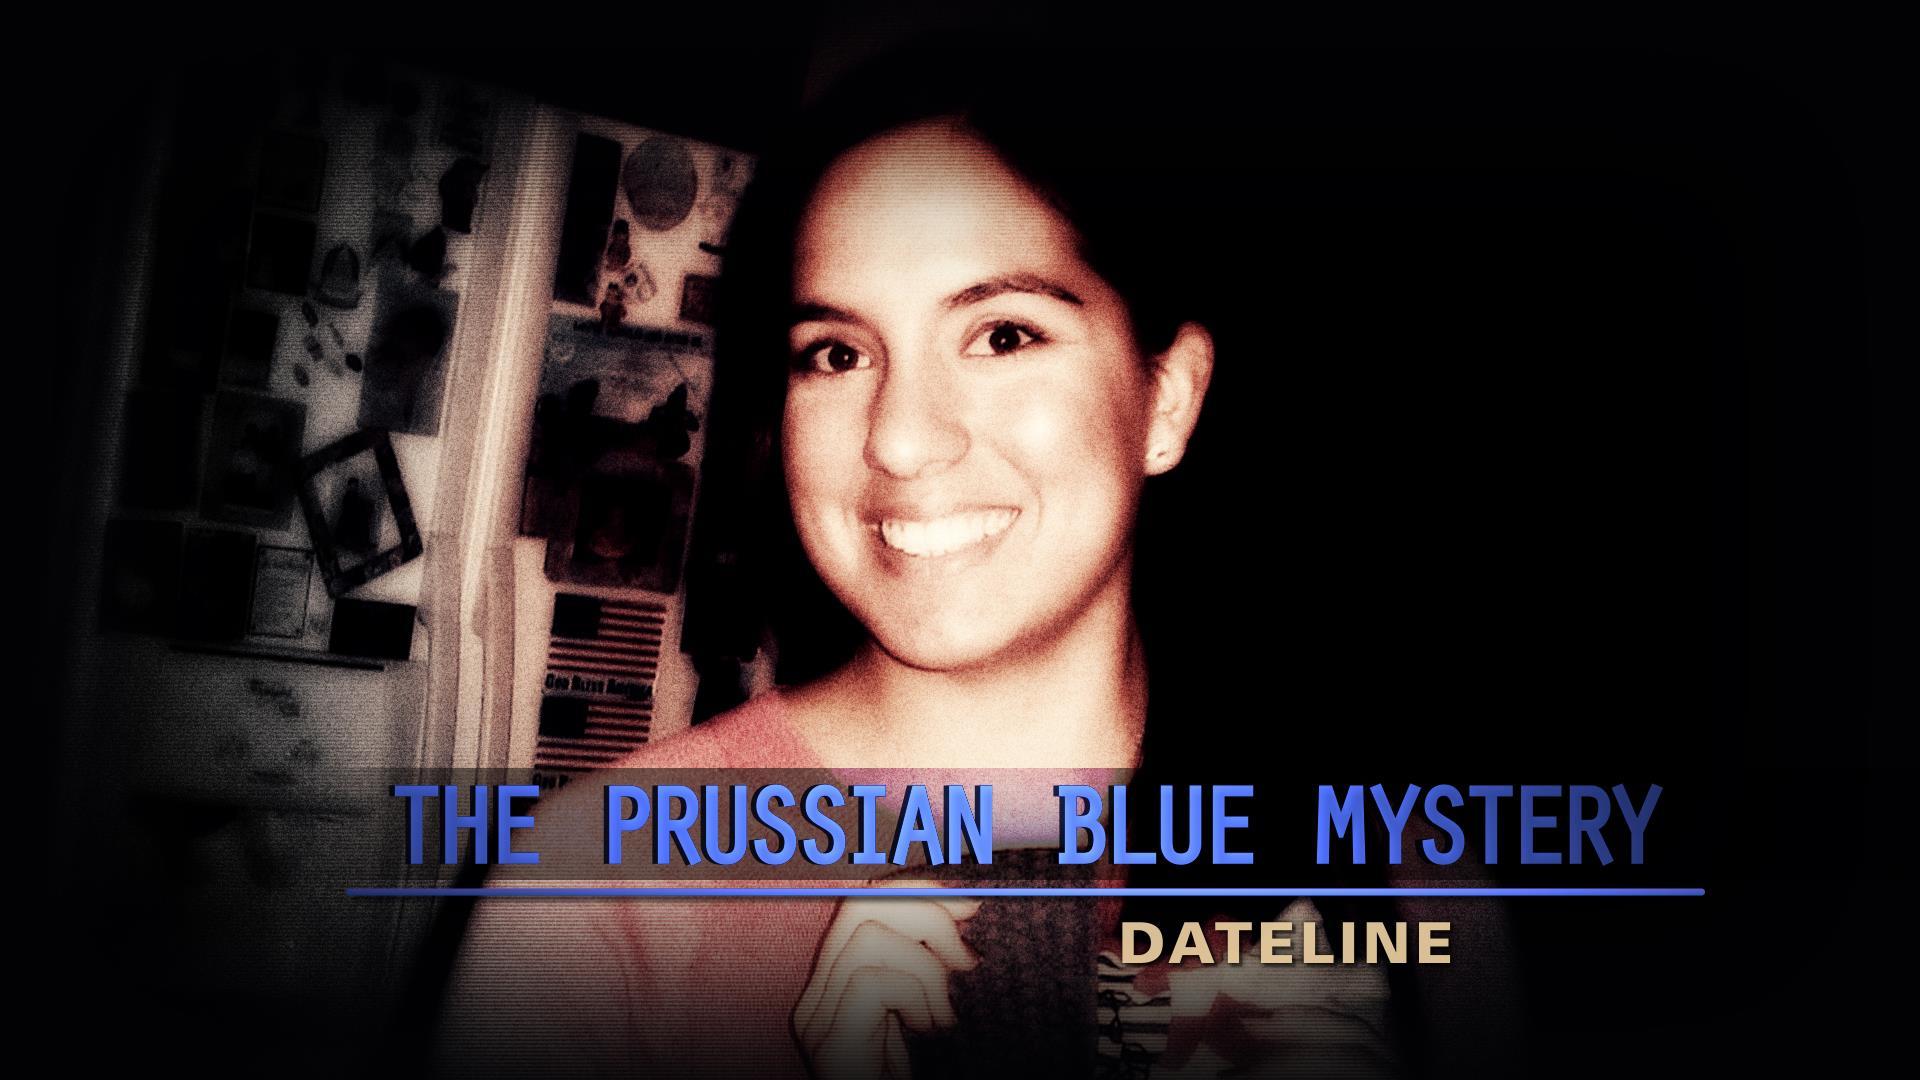 Dateline Episode Trailer: The Prussian Blue Mystery